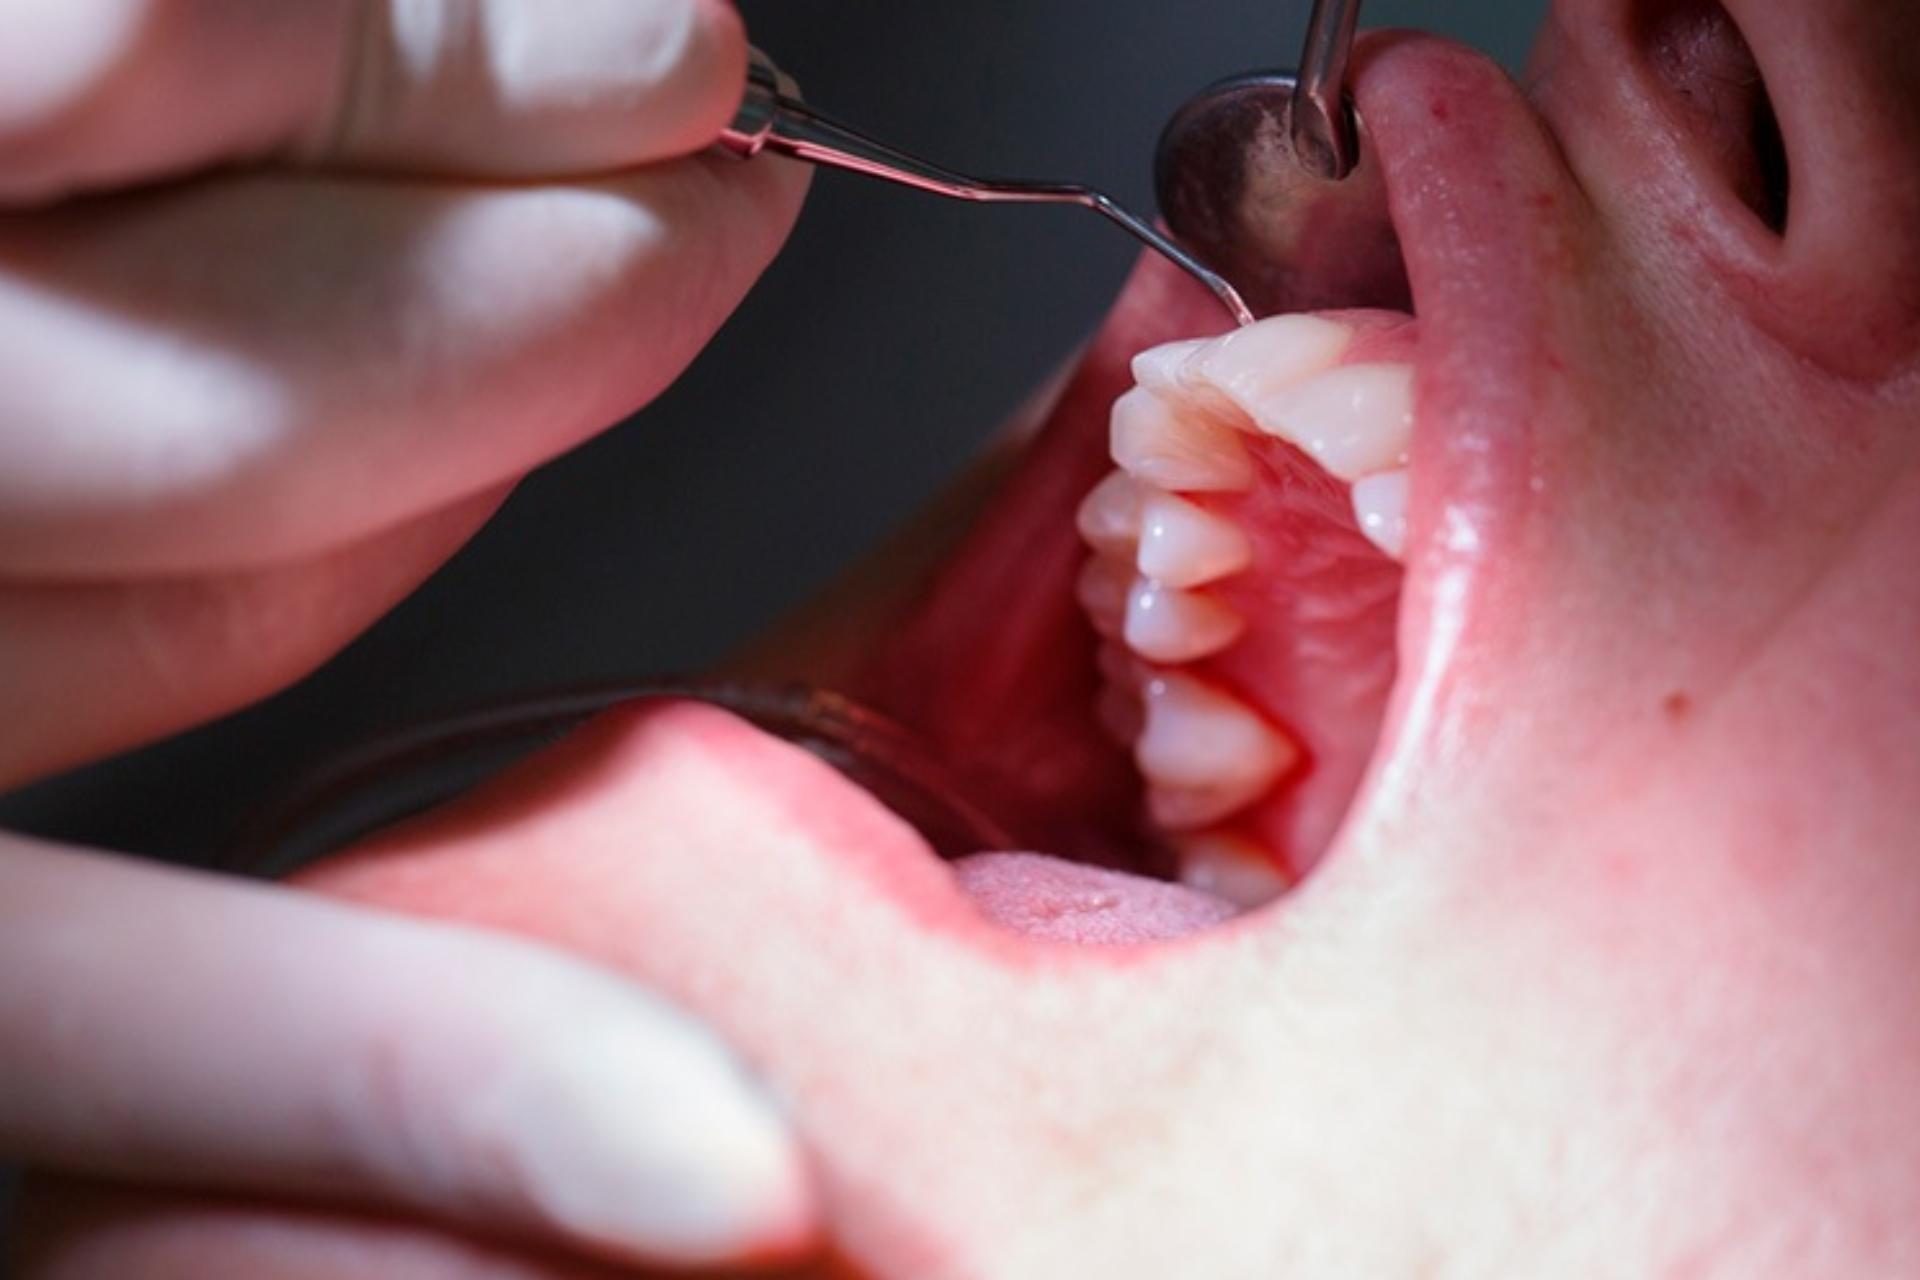 salud-dental-bucales-Tlaxcala-Covid-19-Coronavirus